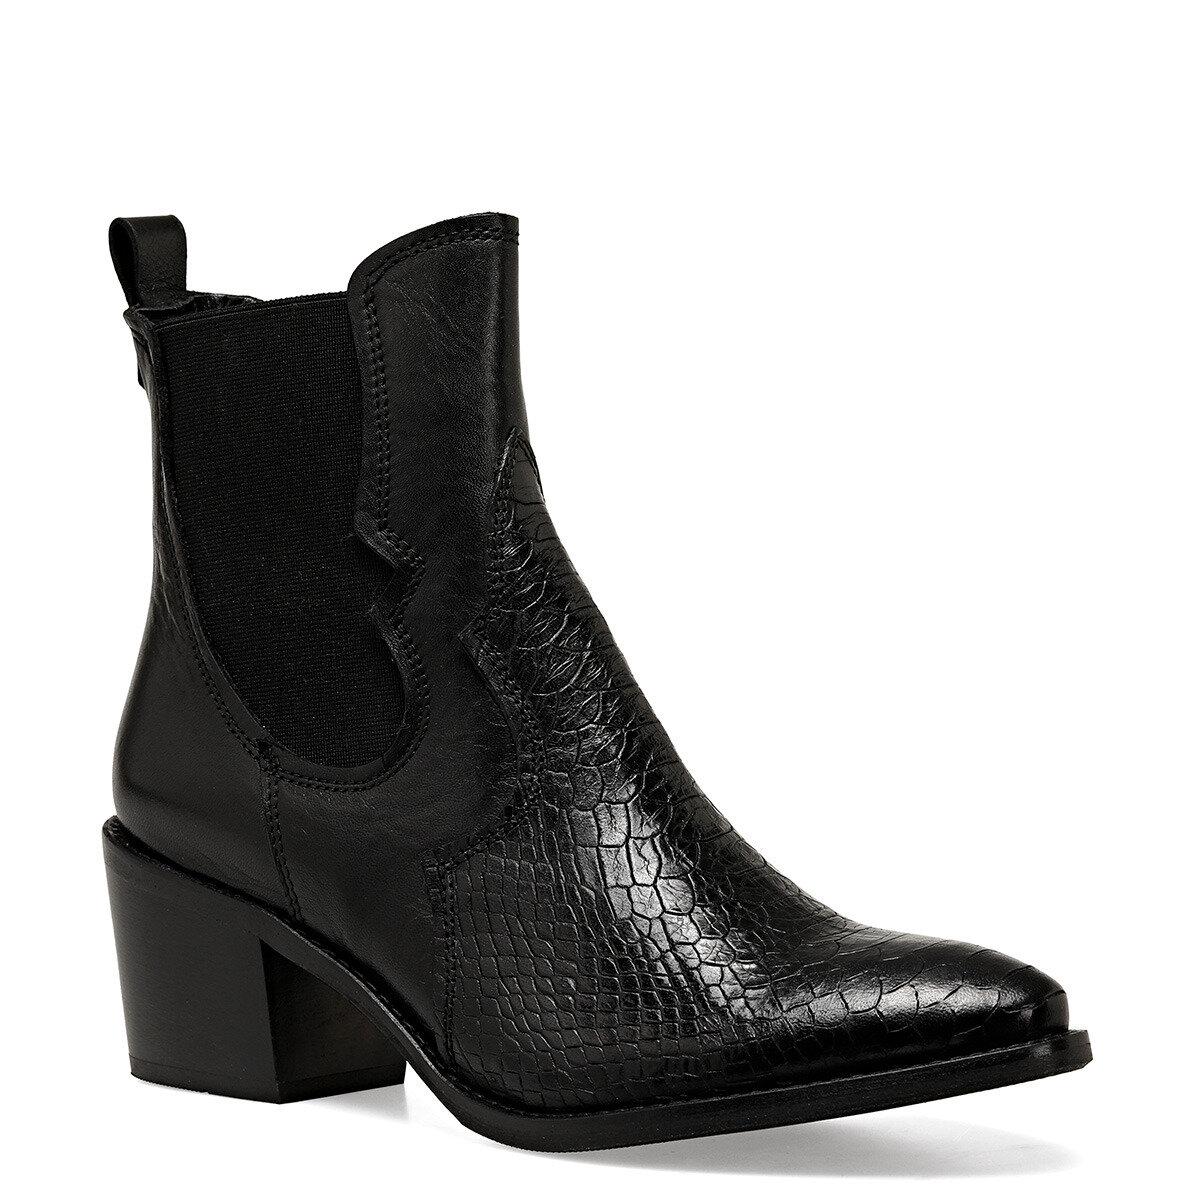 CILENTO Siyah Kadın Topuklu Bot